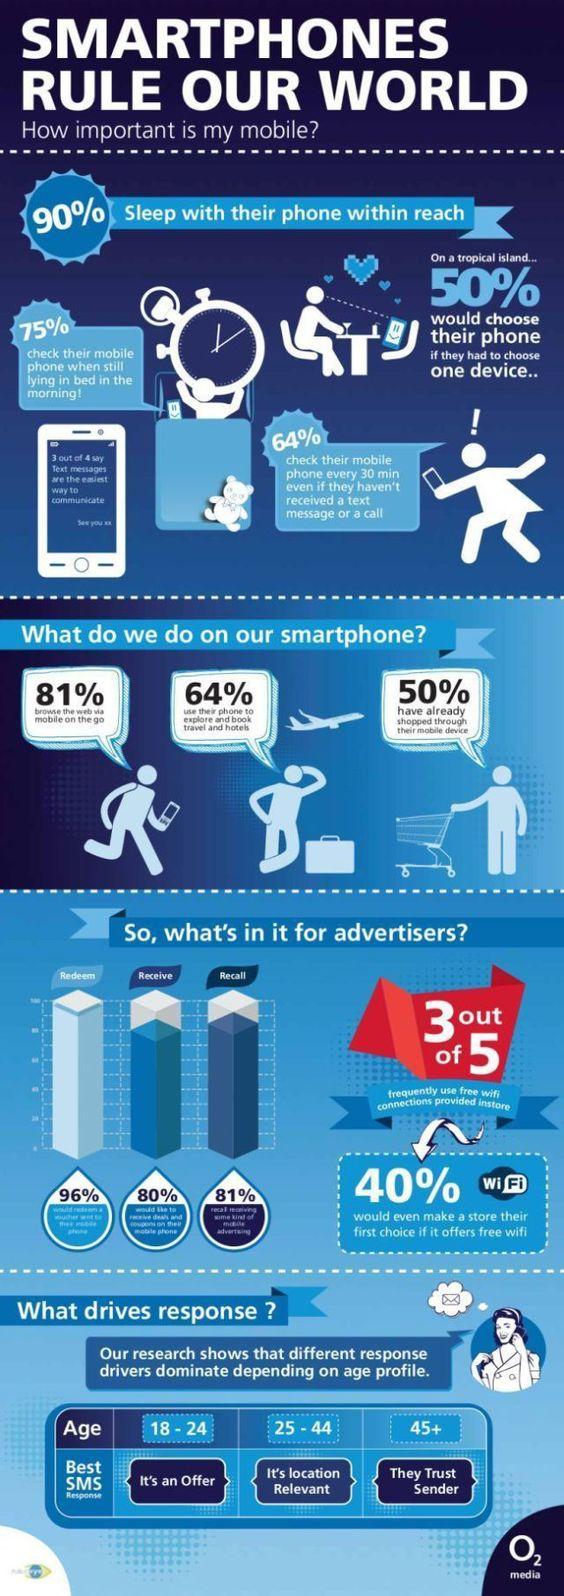 Smartphones rule our world #infografia #infographic #internet